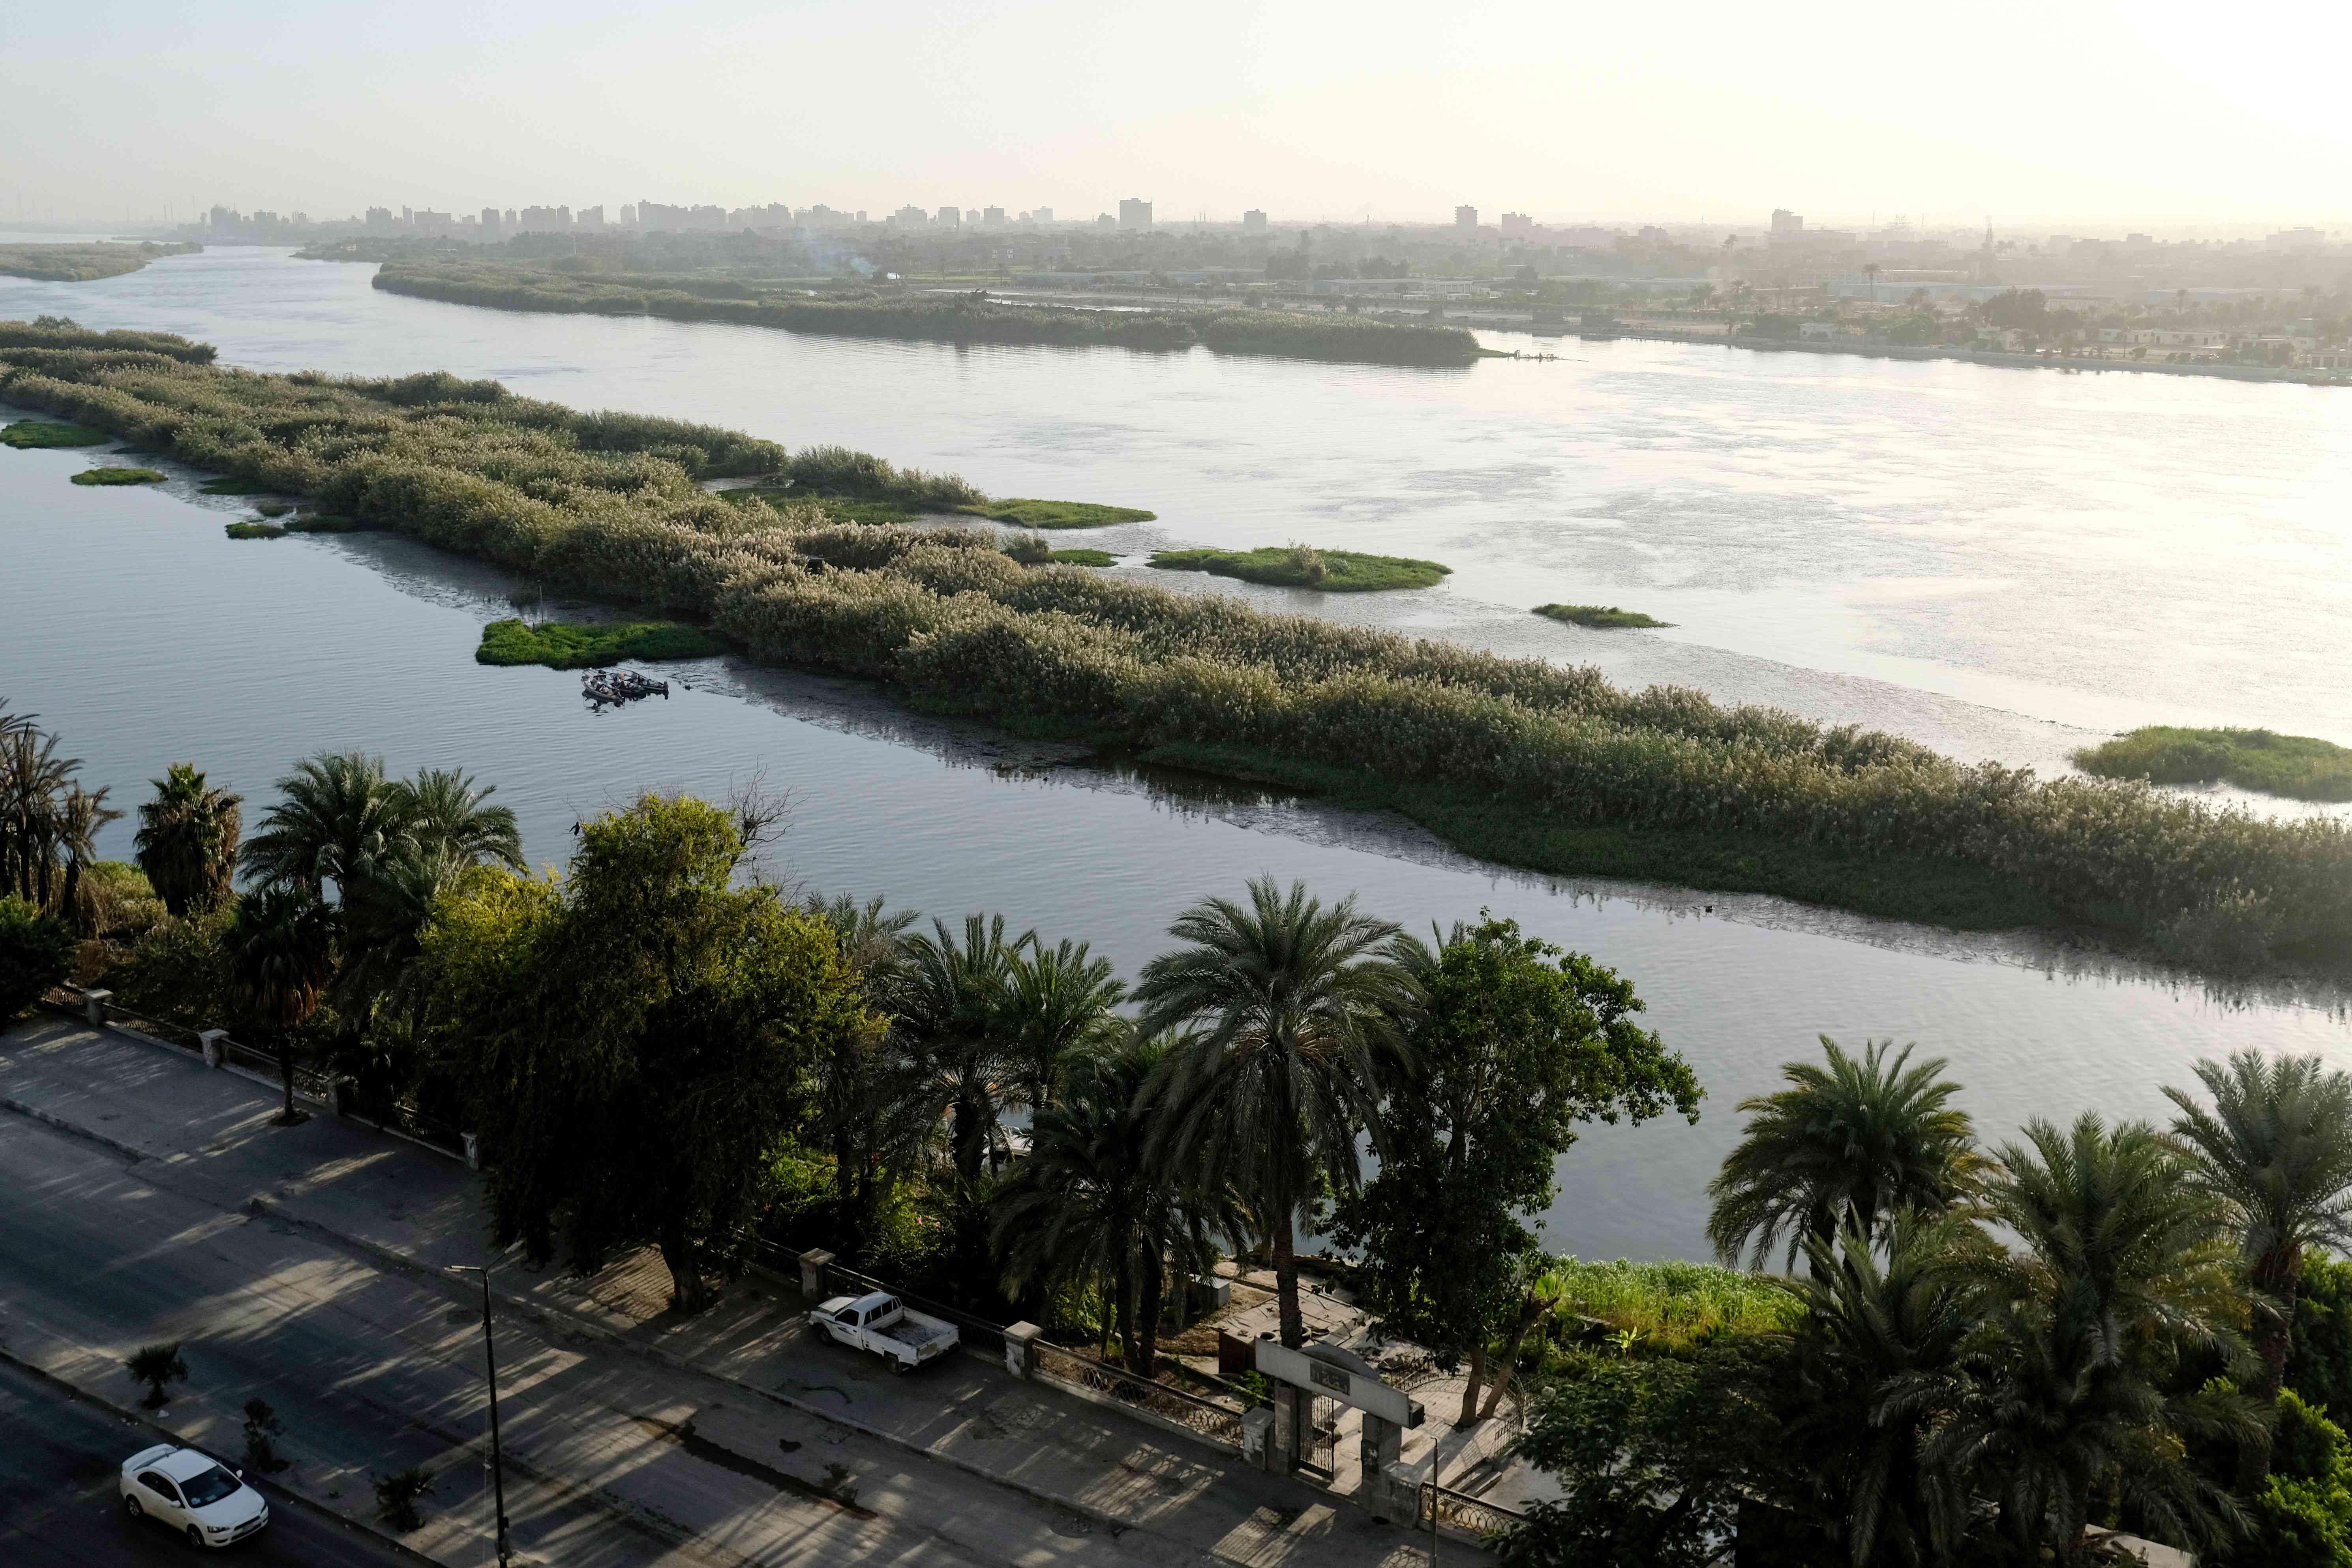 Nile River in Cairo, Egypt